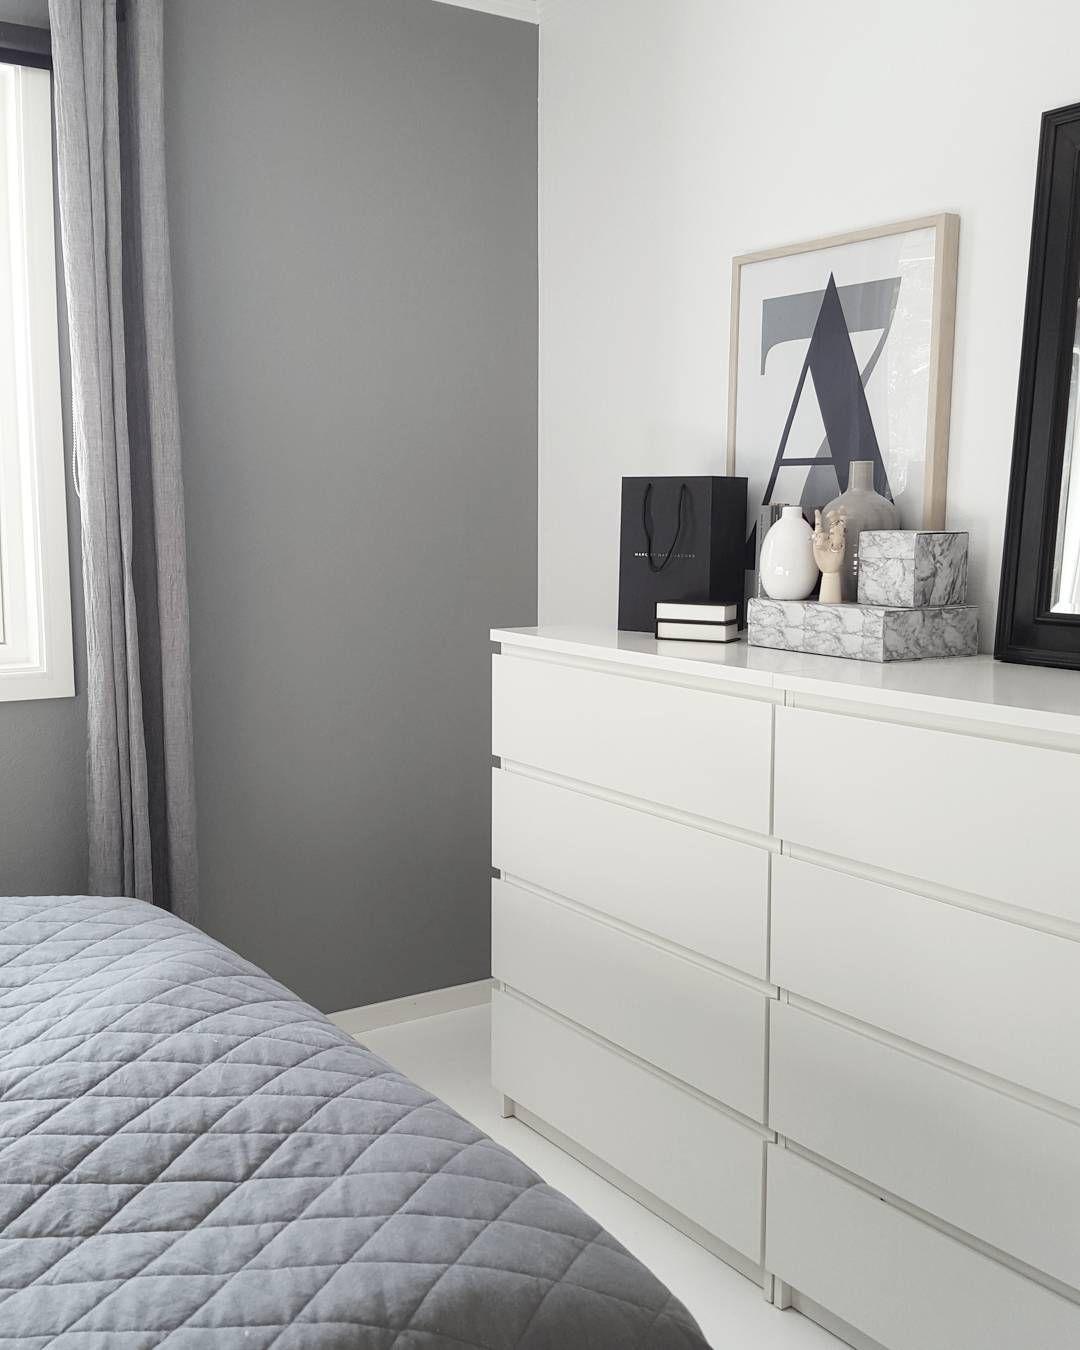 Ikea Malm Dressers Ritavalstad White Bedroom Furniture Ikea